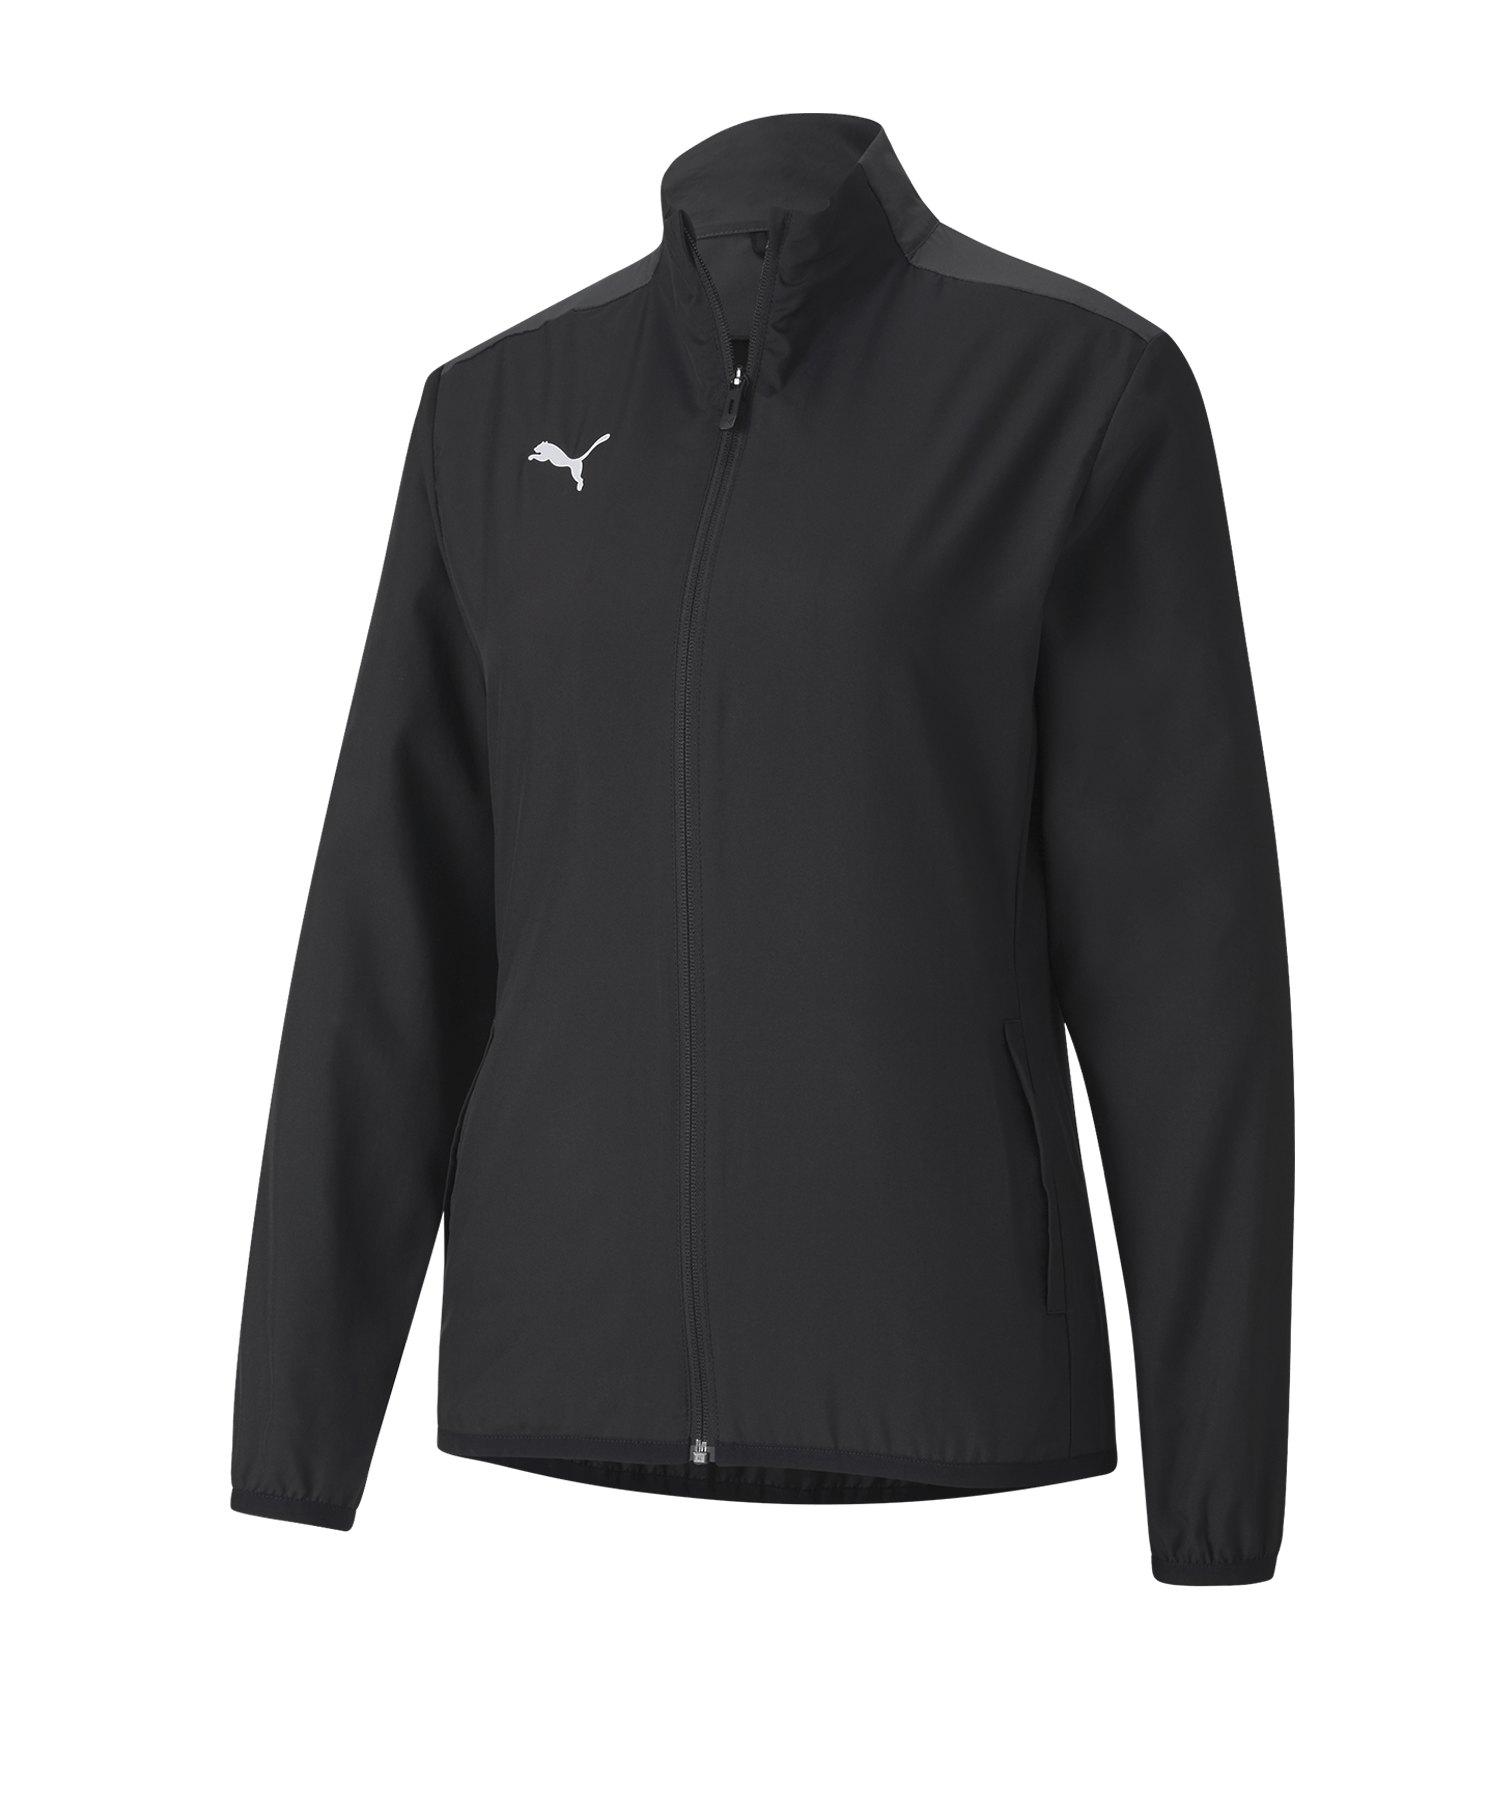 PUMA teamGOAL 23 Sideline Trainingsjacke Damen F03 - schwarz